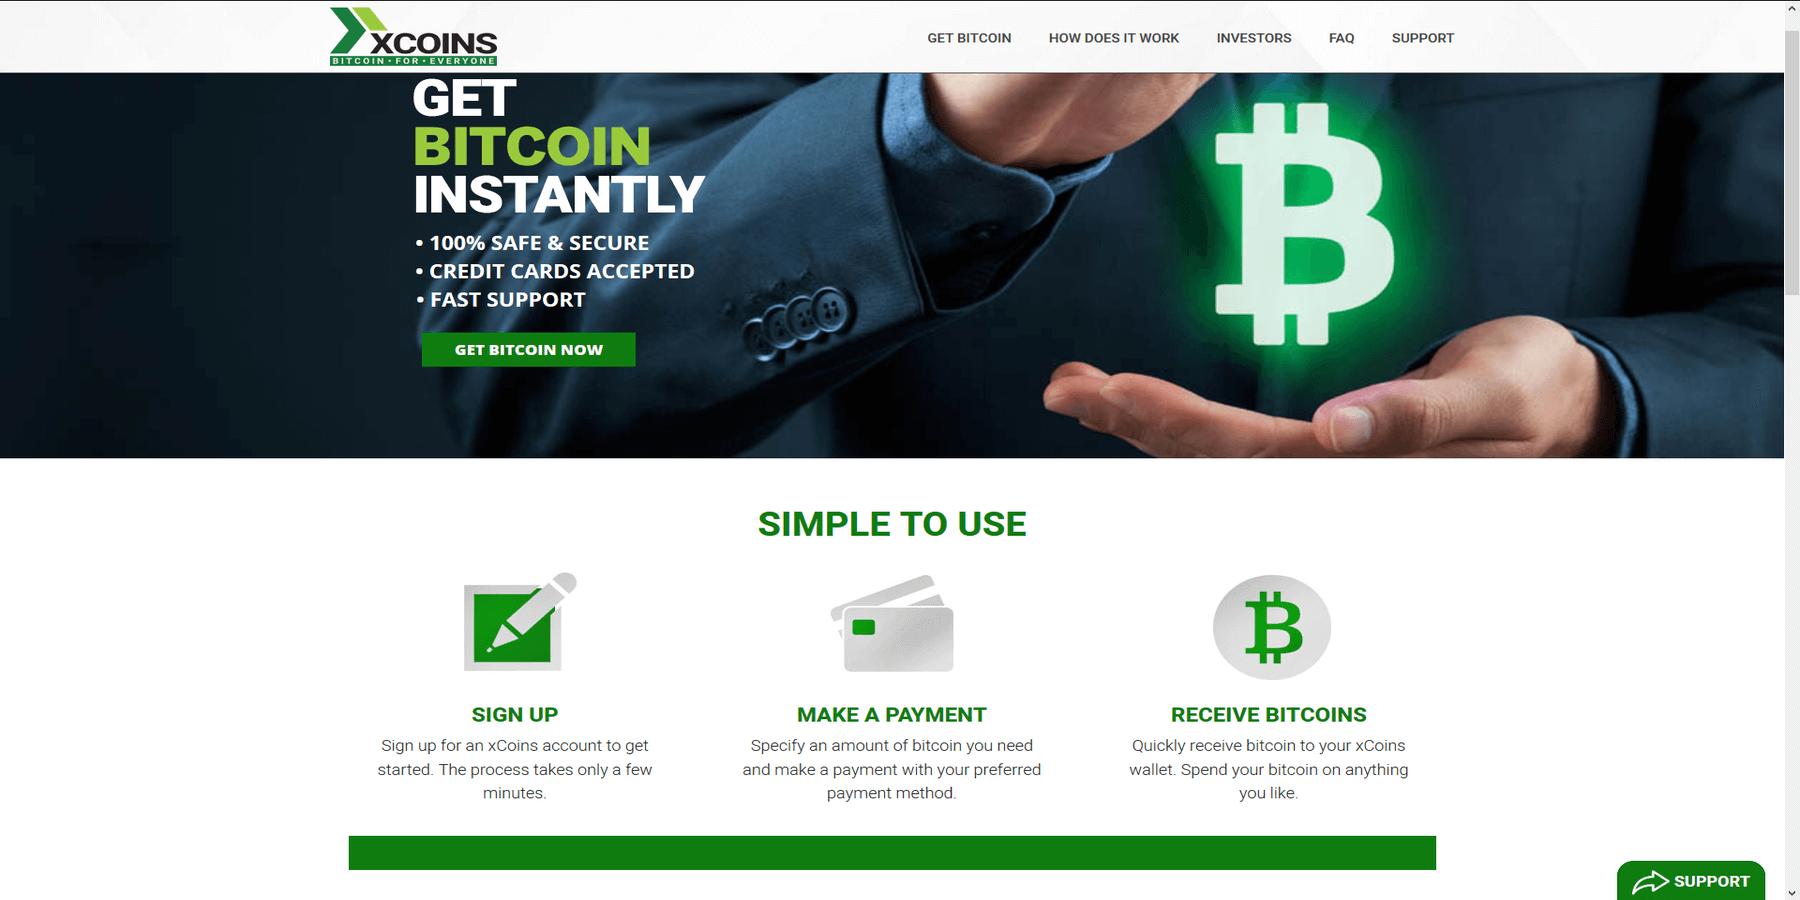 Acheter des cryptomonnaies chez Xcoins